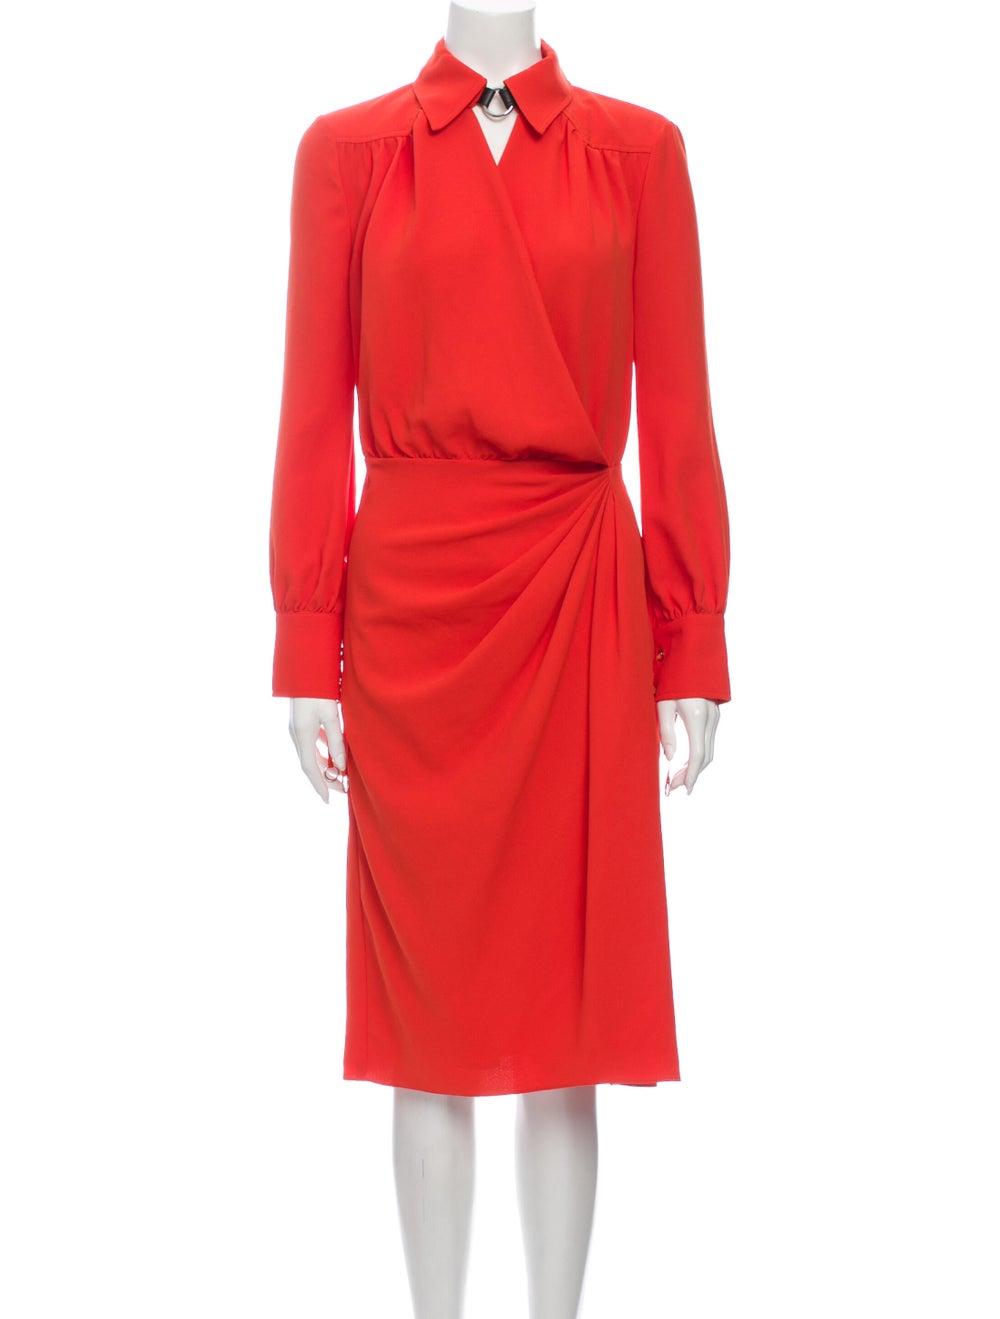 Altuzarra Midi Length Dress Orange - image 1